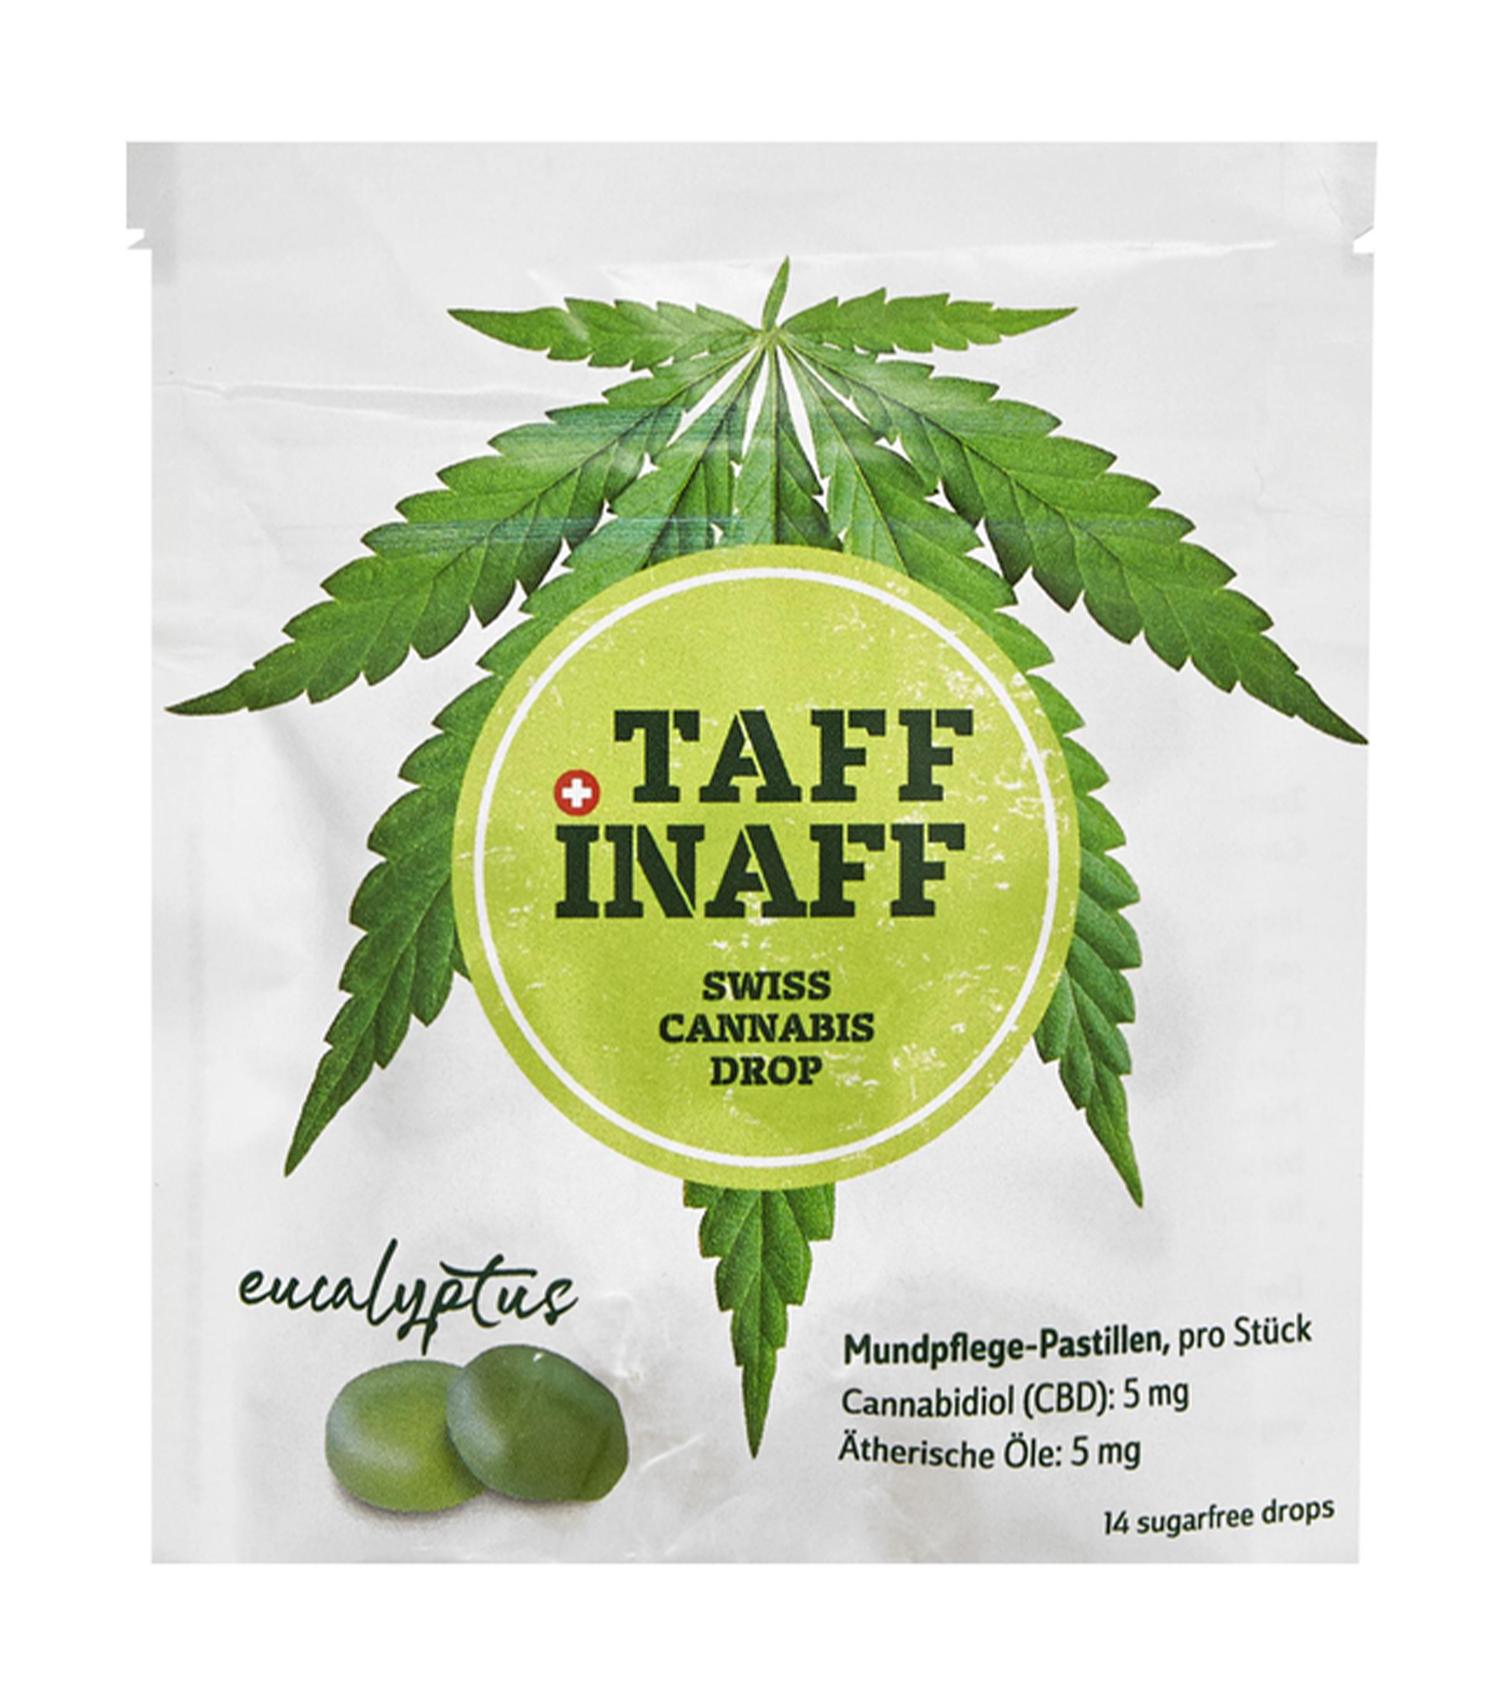 Bonbons - Taff Inaff